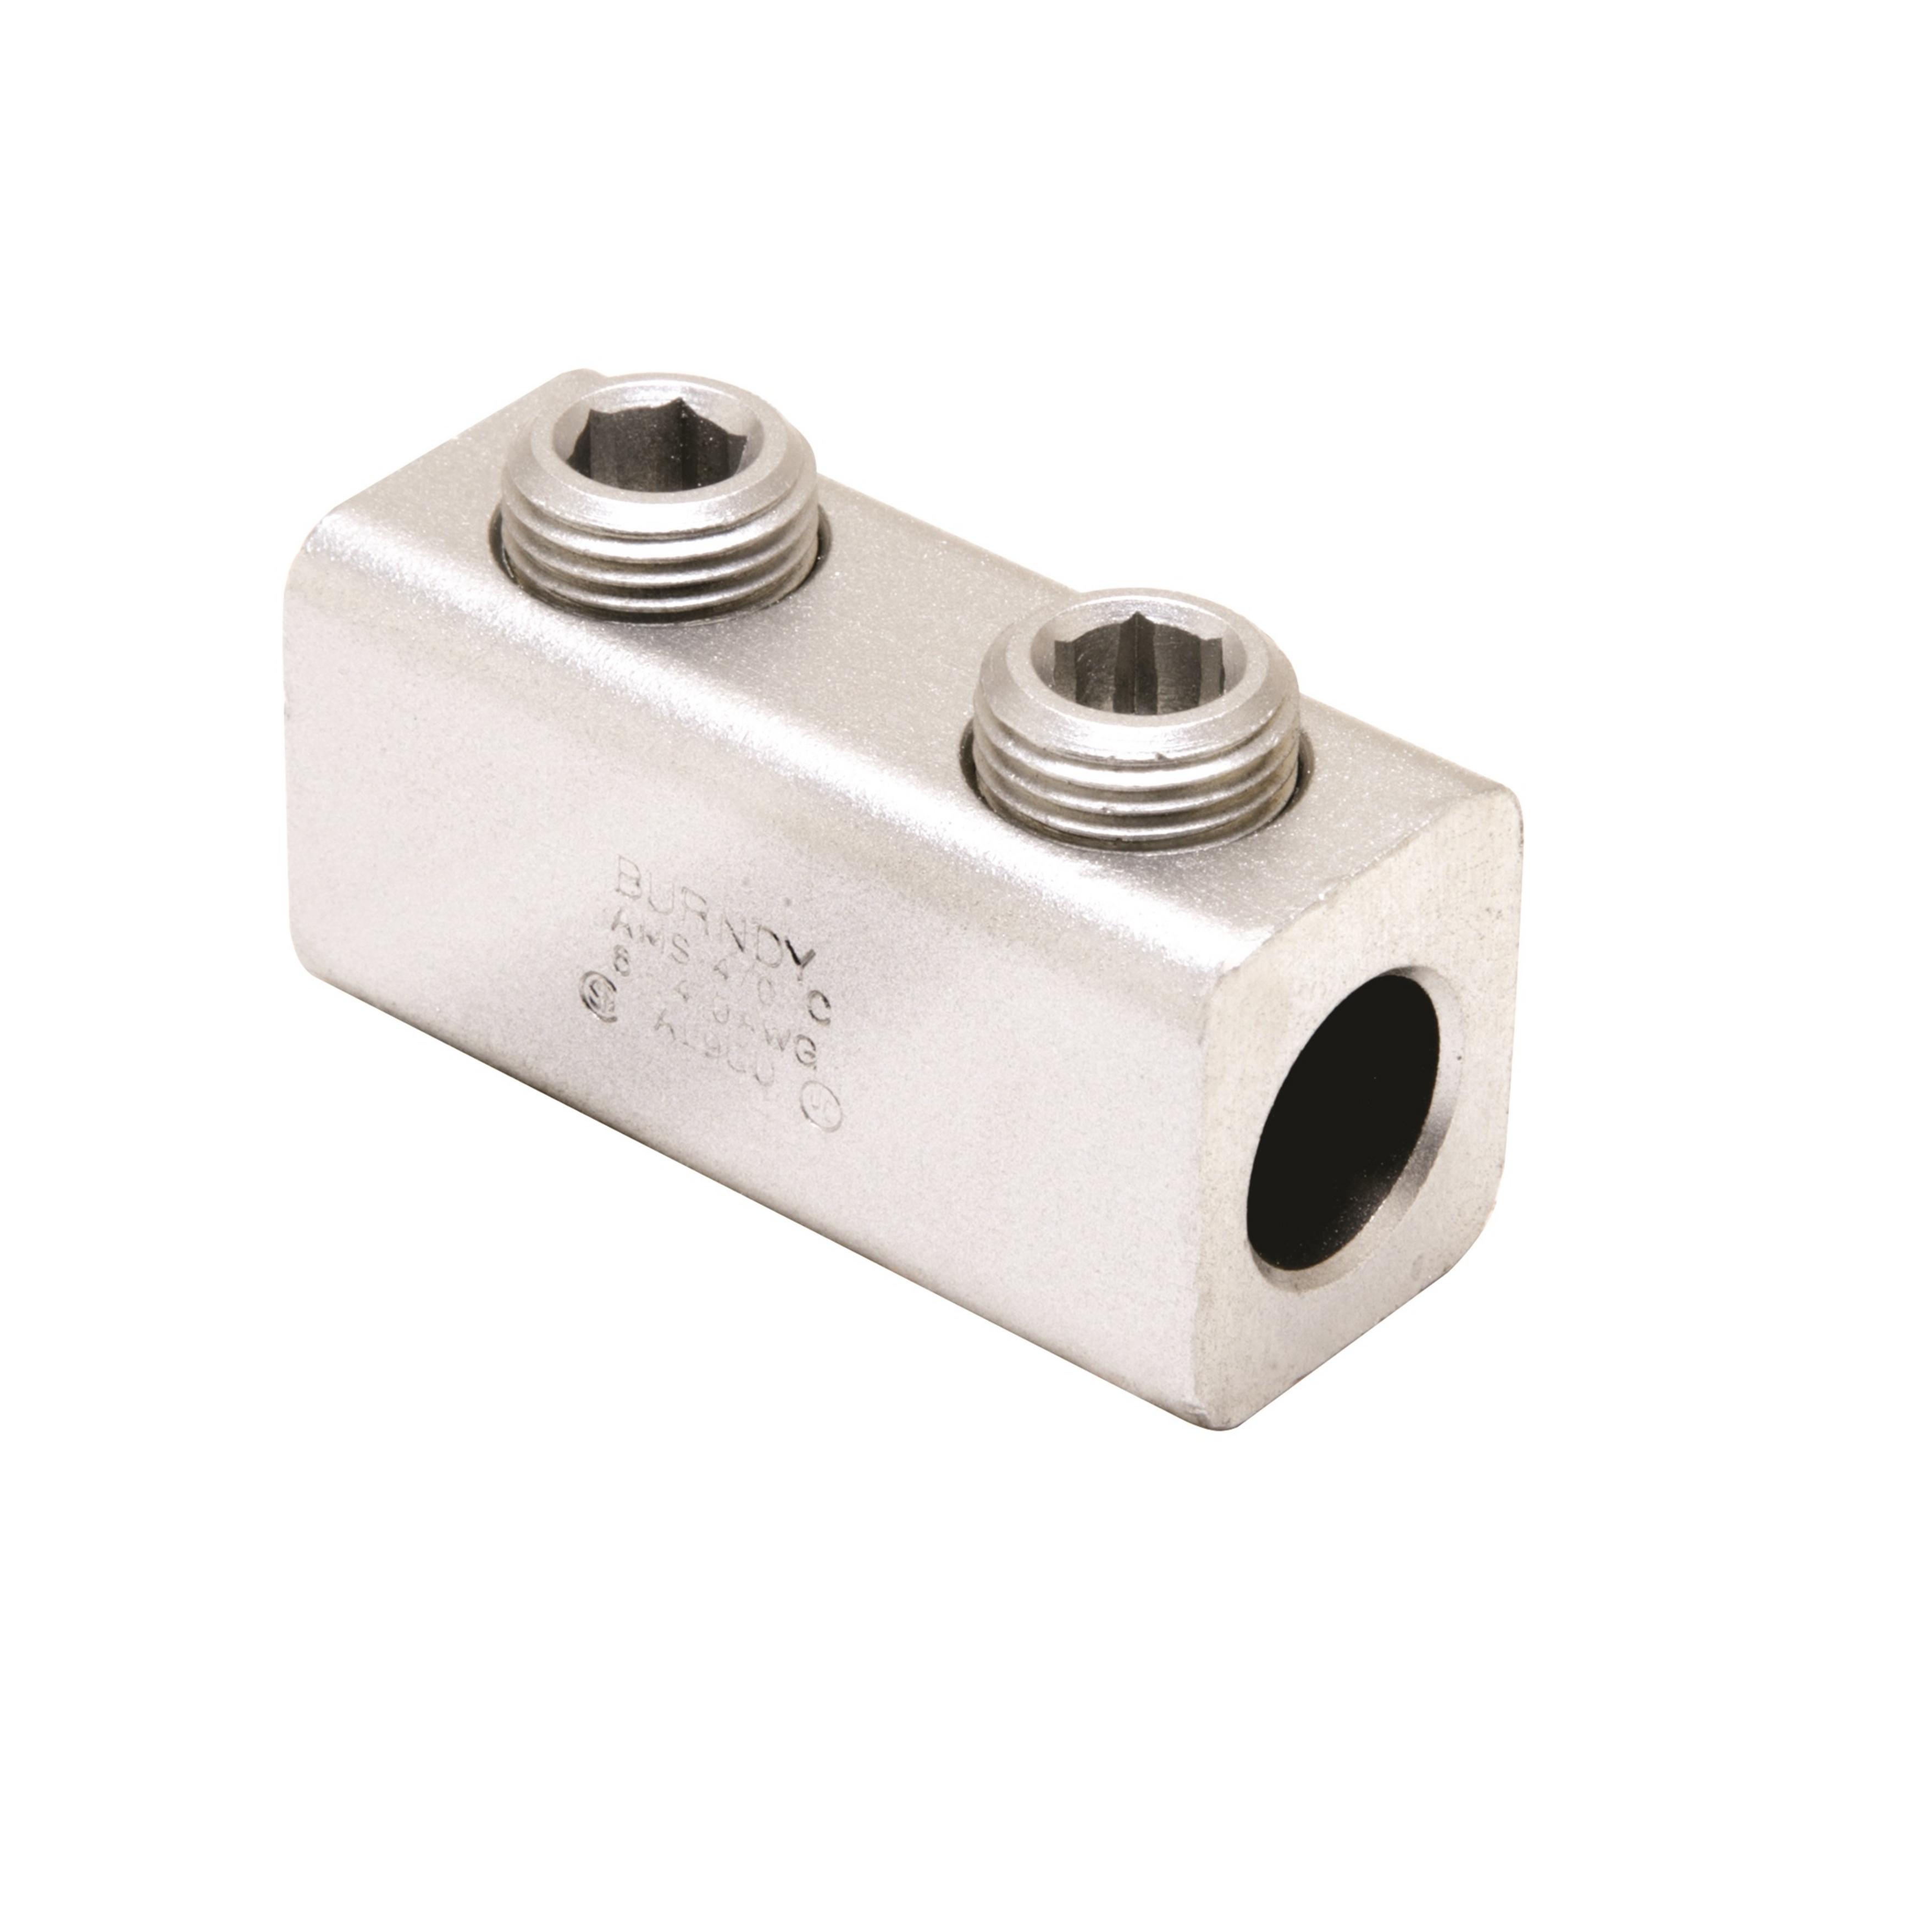 GAR6426 Qty 5 Burndy Wire to Rebar Conductor 3//8 I.P.S Tube